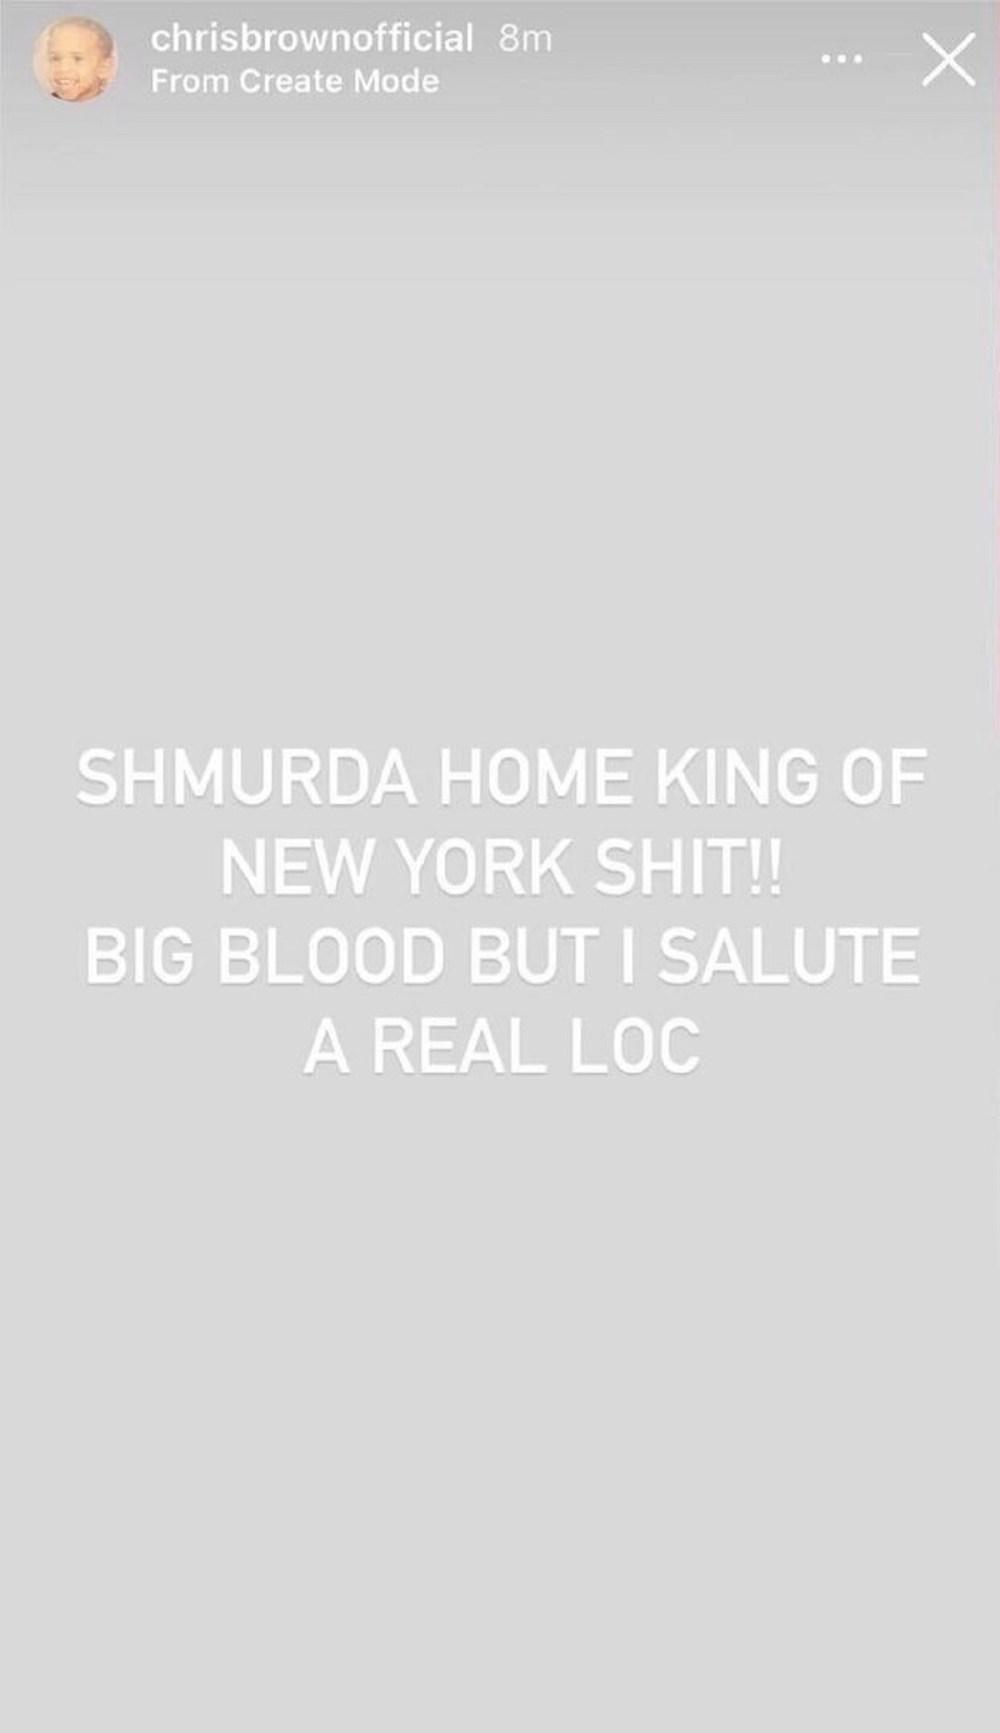 Chris Brown Bobby Shmurda King of New York